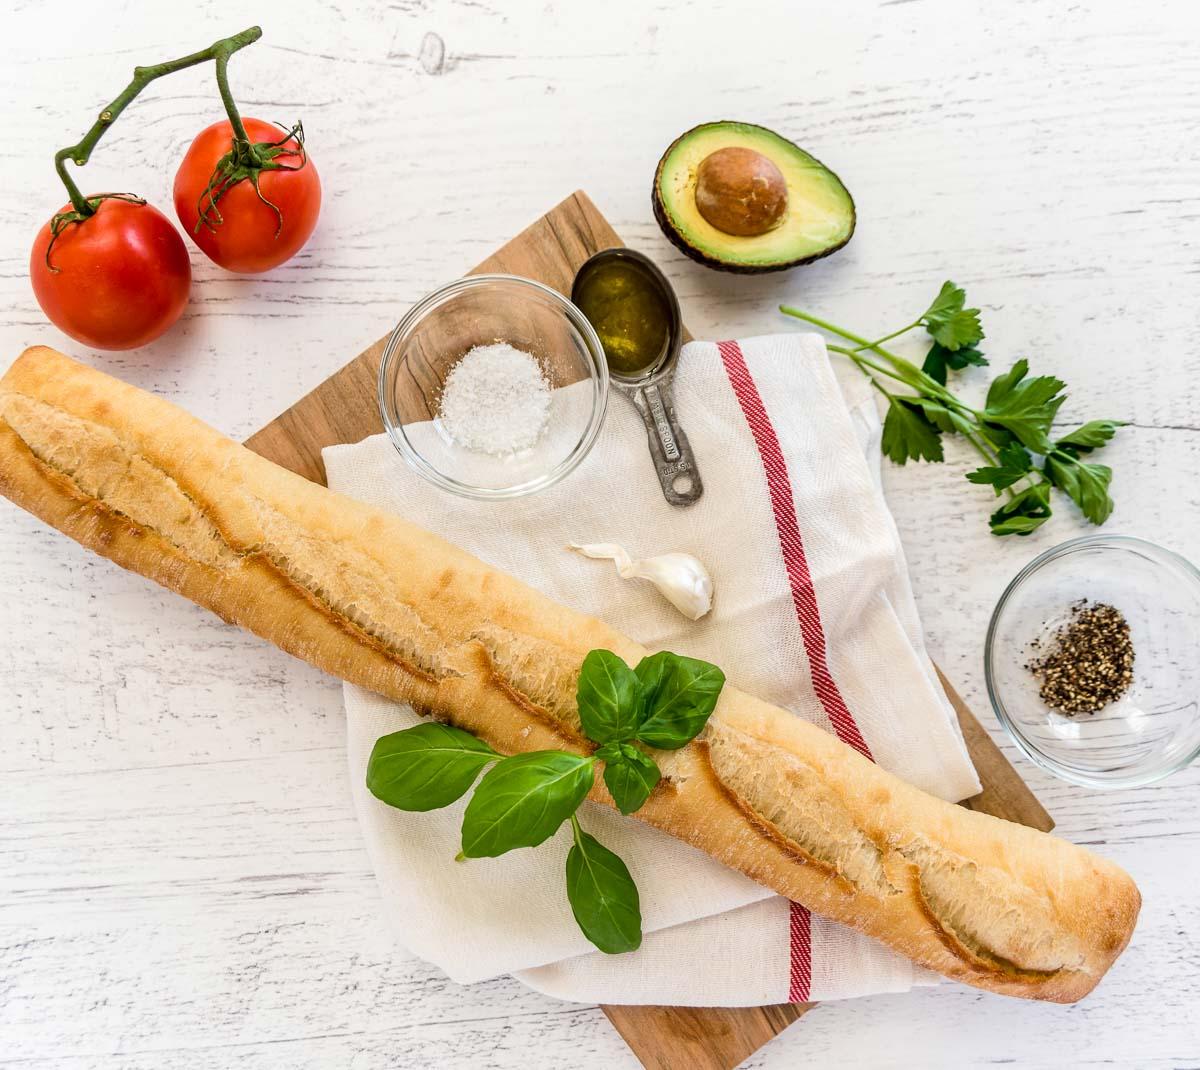 Ingredients for tomato avocado bruschetta.